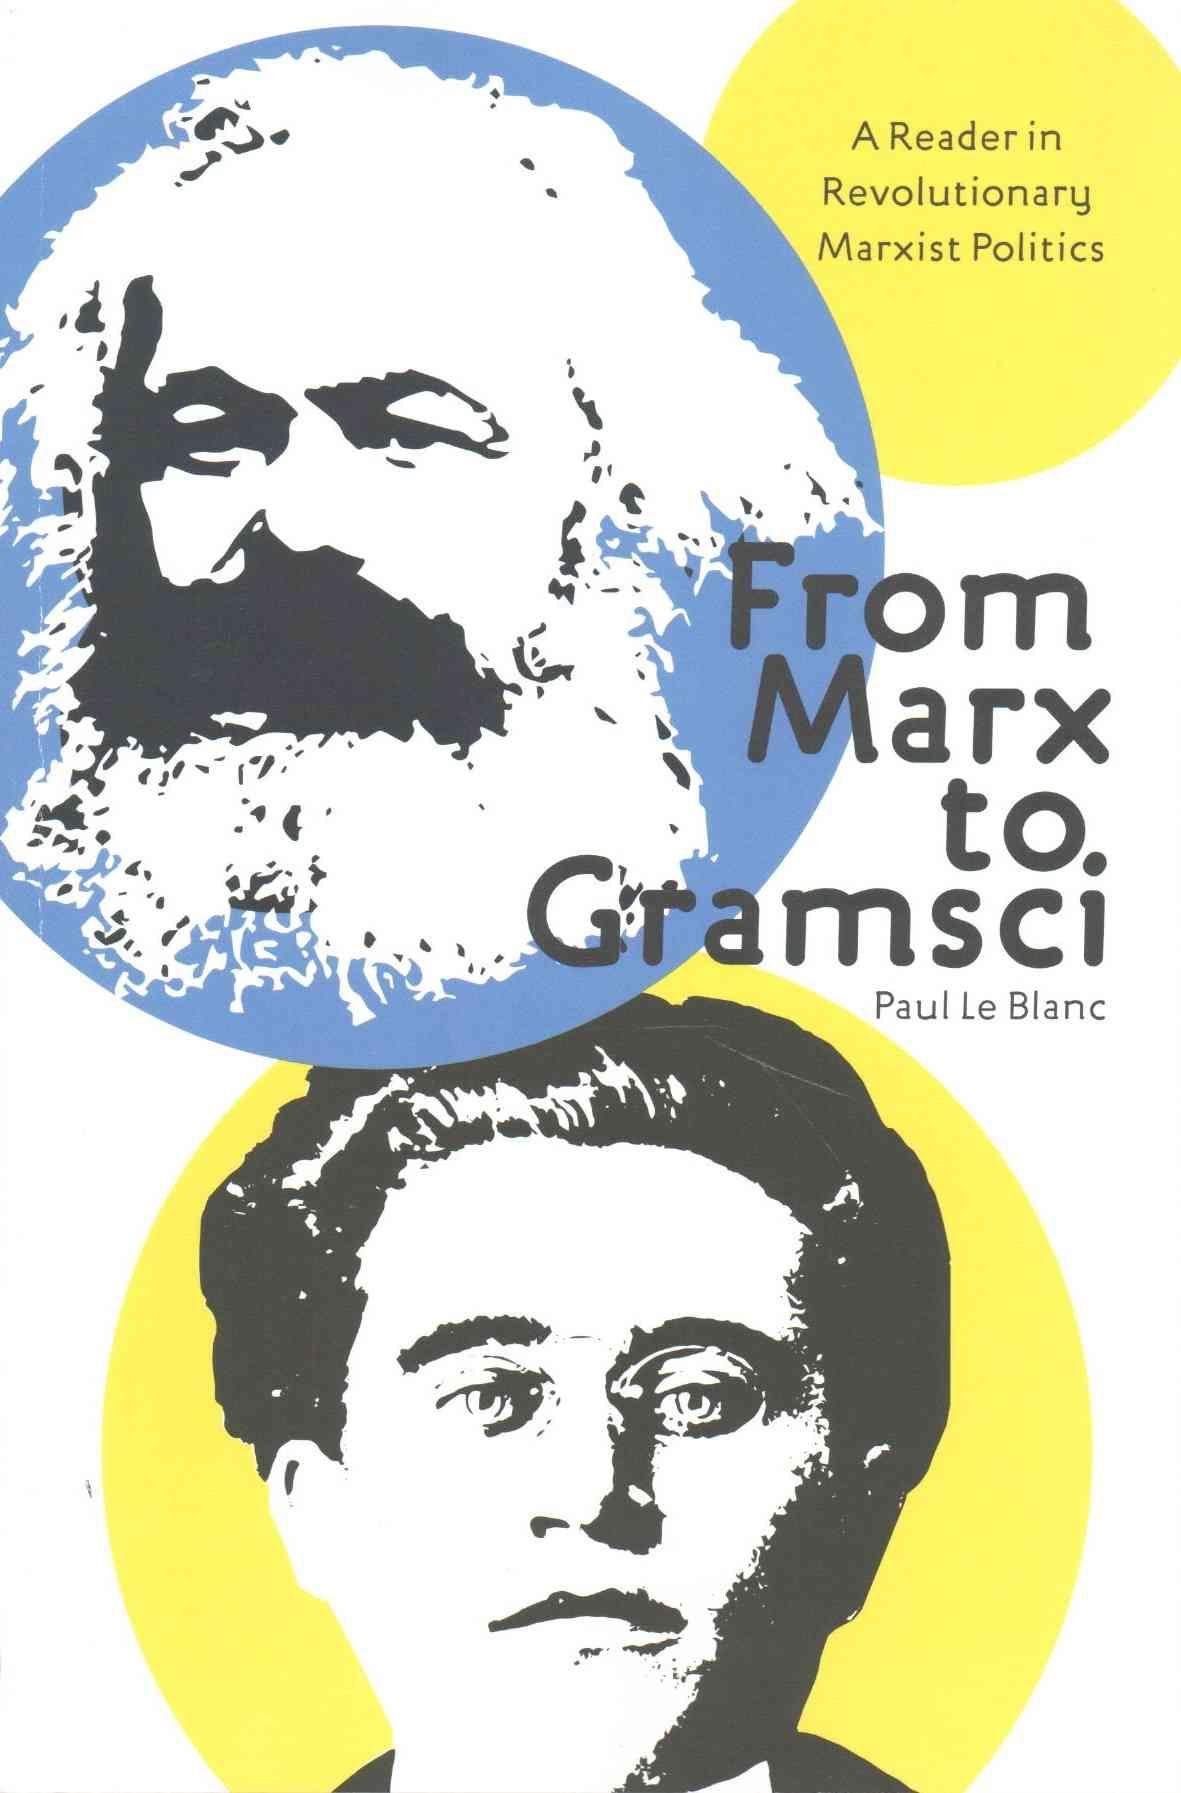 From Marx to Gramsci: A Reader in Revolutionary Marxist Politics